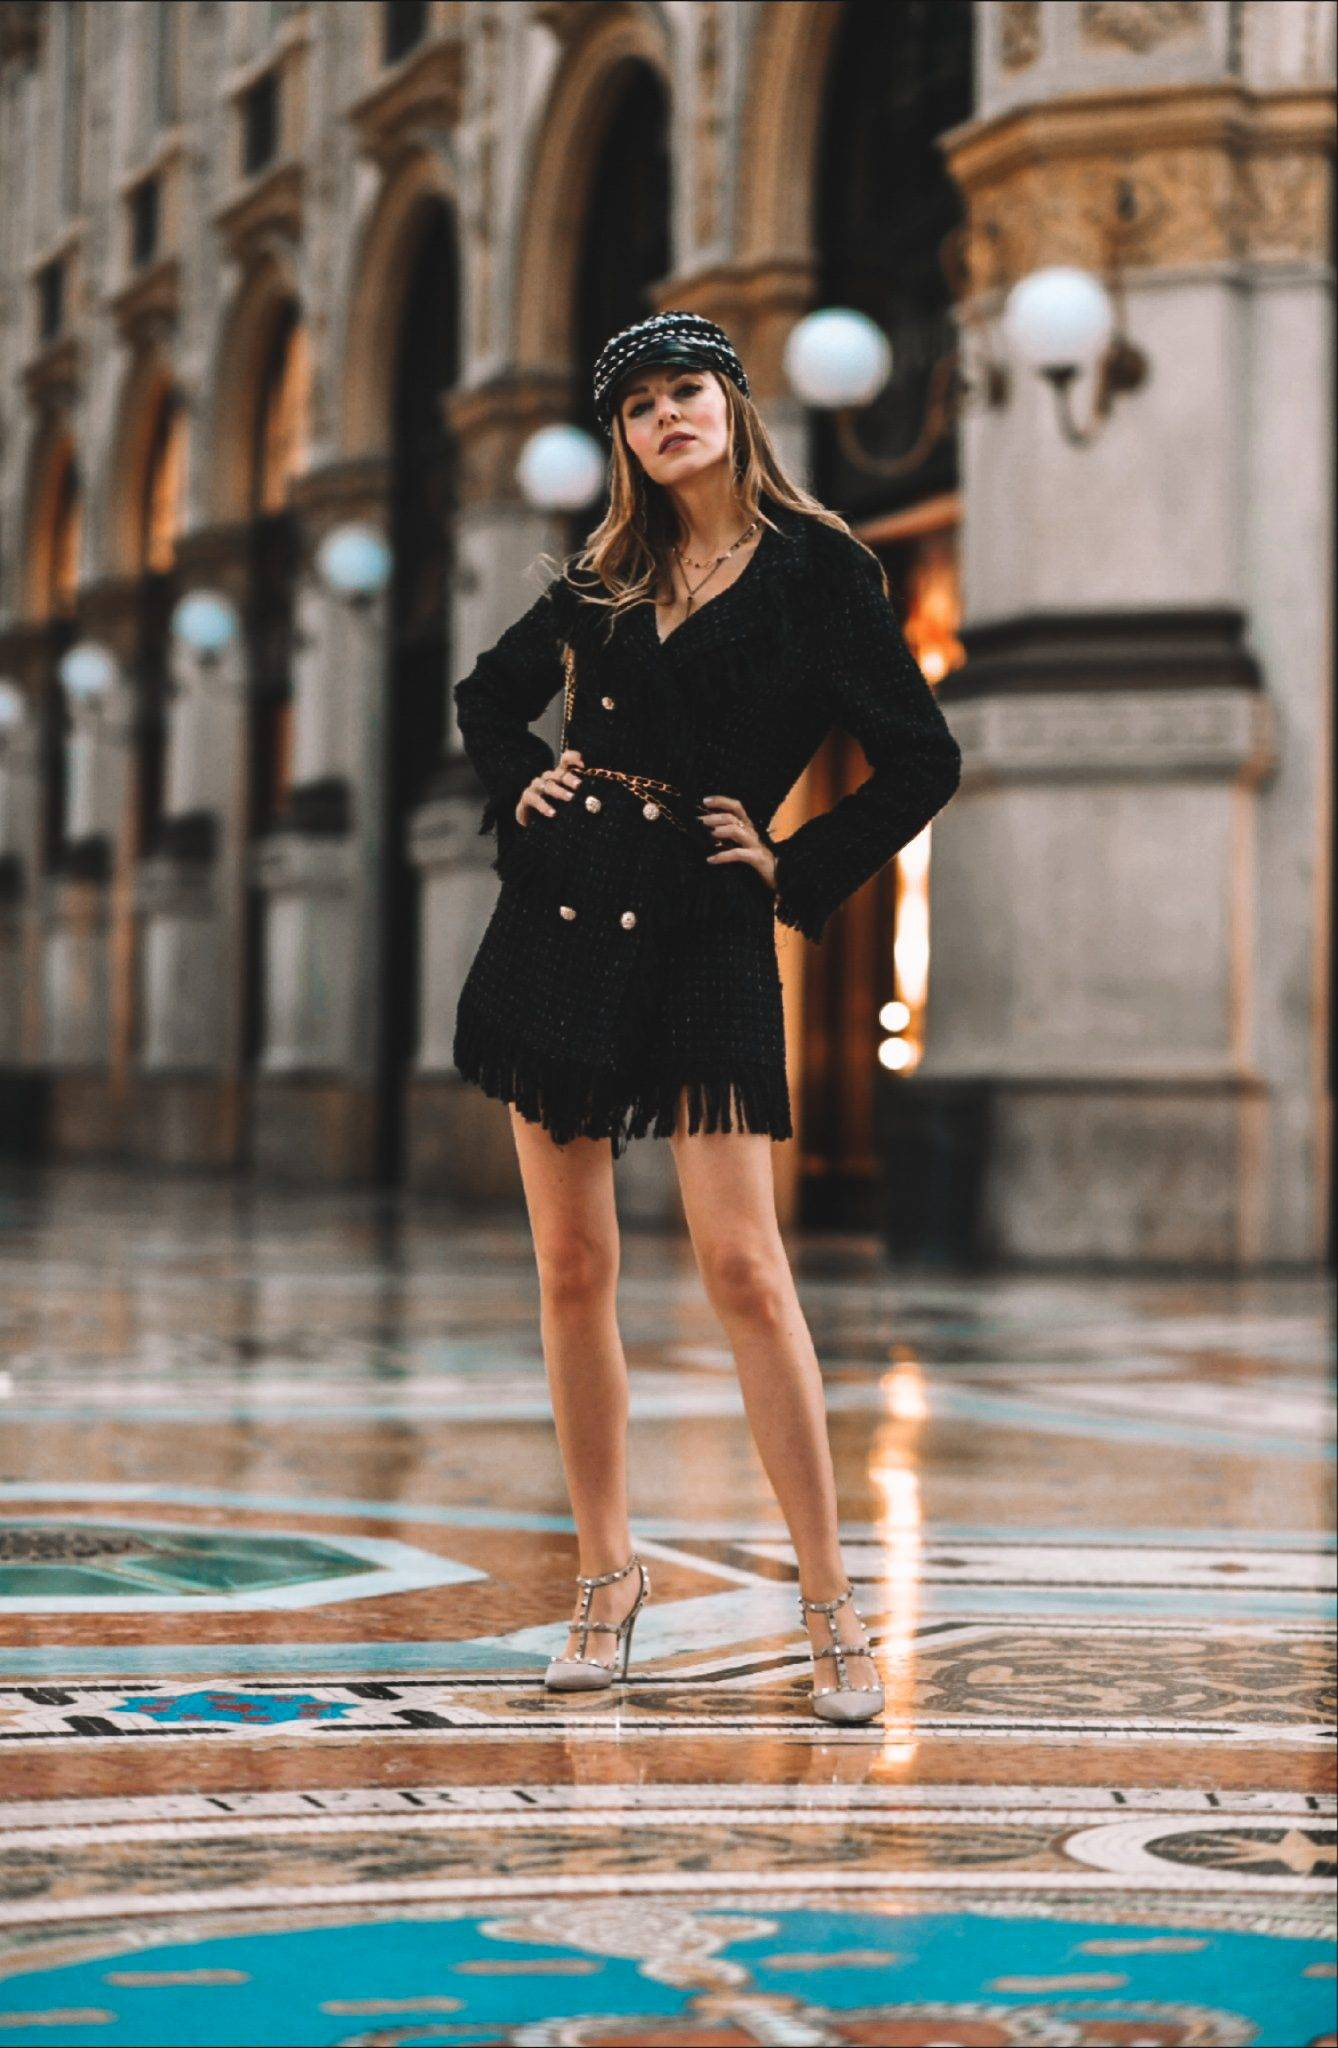 Bella_Zofia is wearing Millé Milano look,  Izabela Switon-Kulinska   In Galleria Vittorio Emanuele Milan.